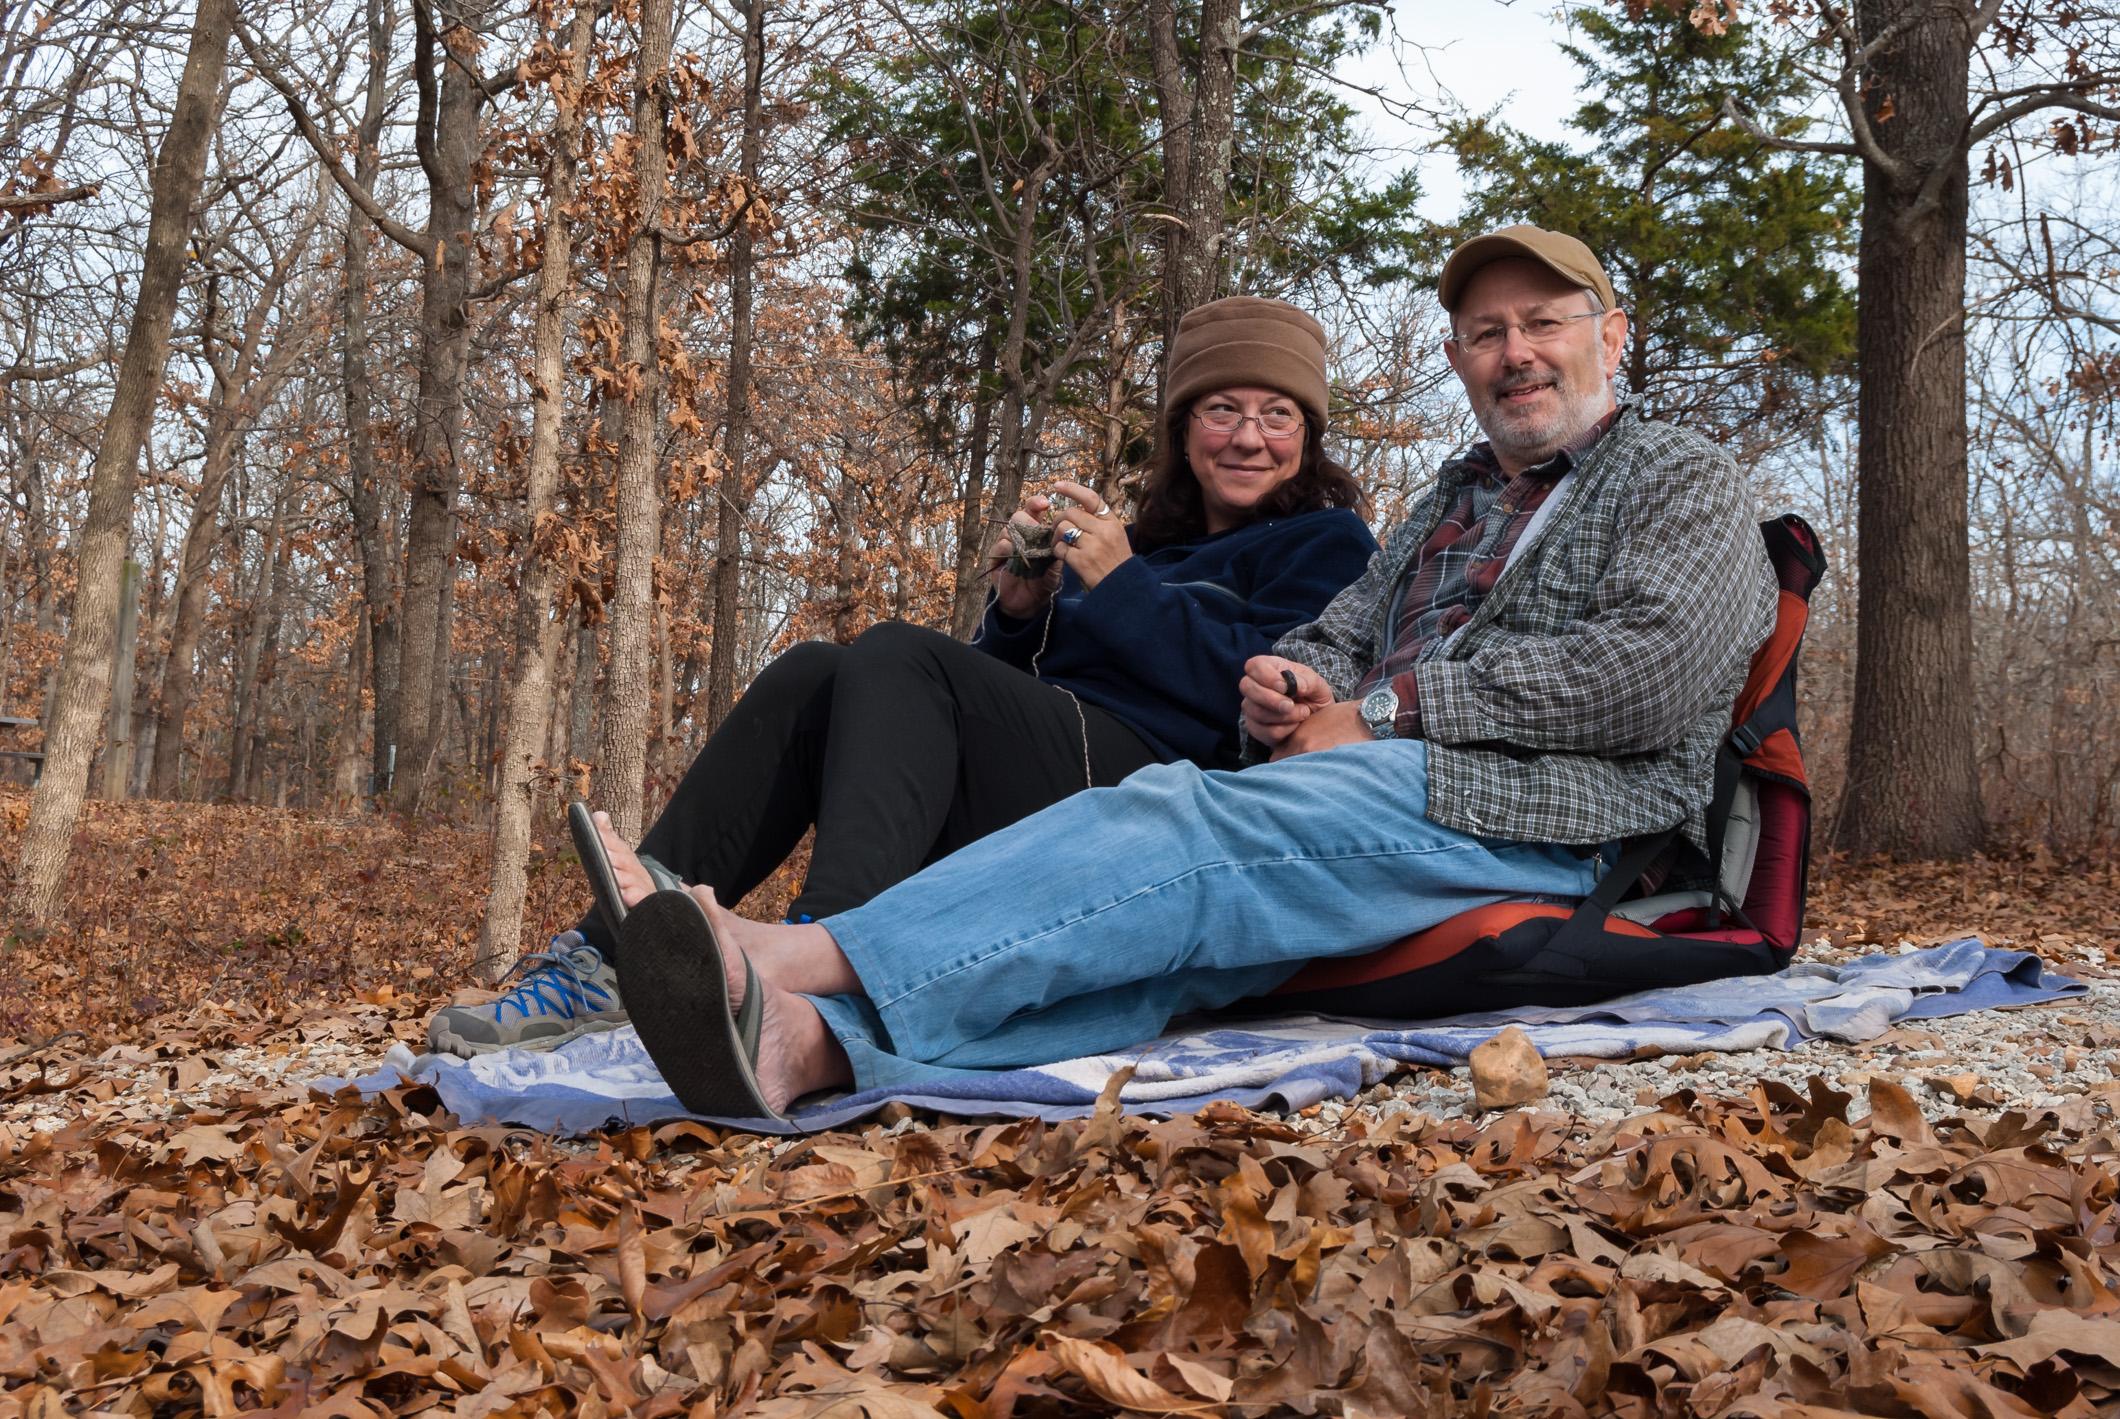 Gary and Ginger Allman at Truman Lake, Missouri, wildlife and lake watching